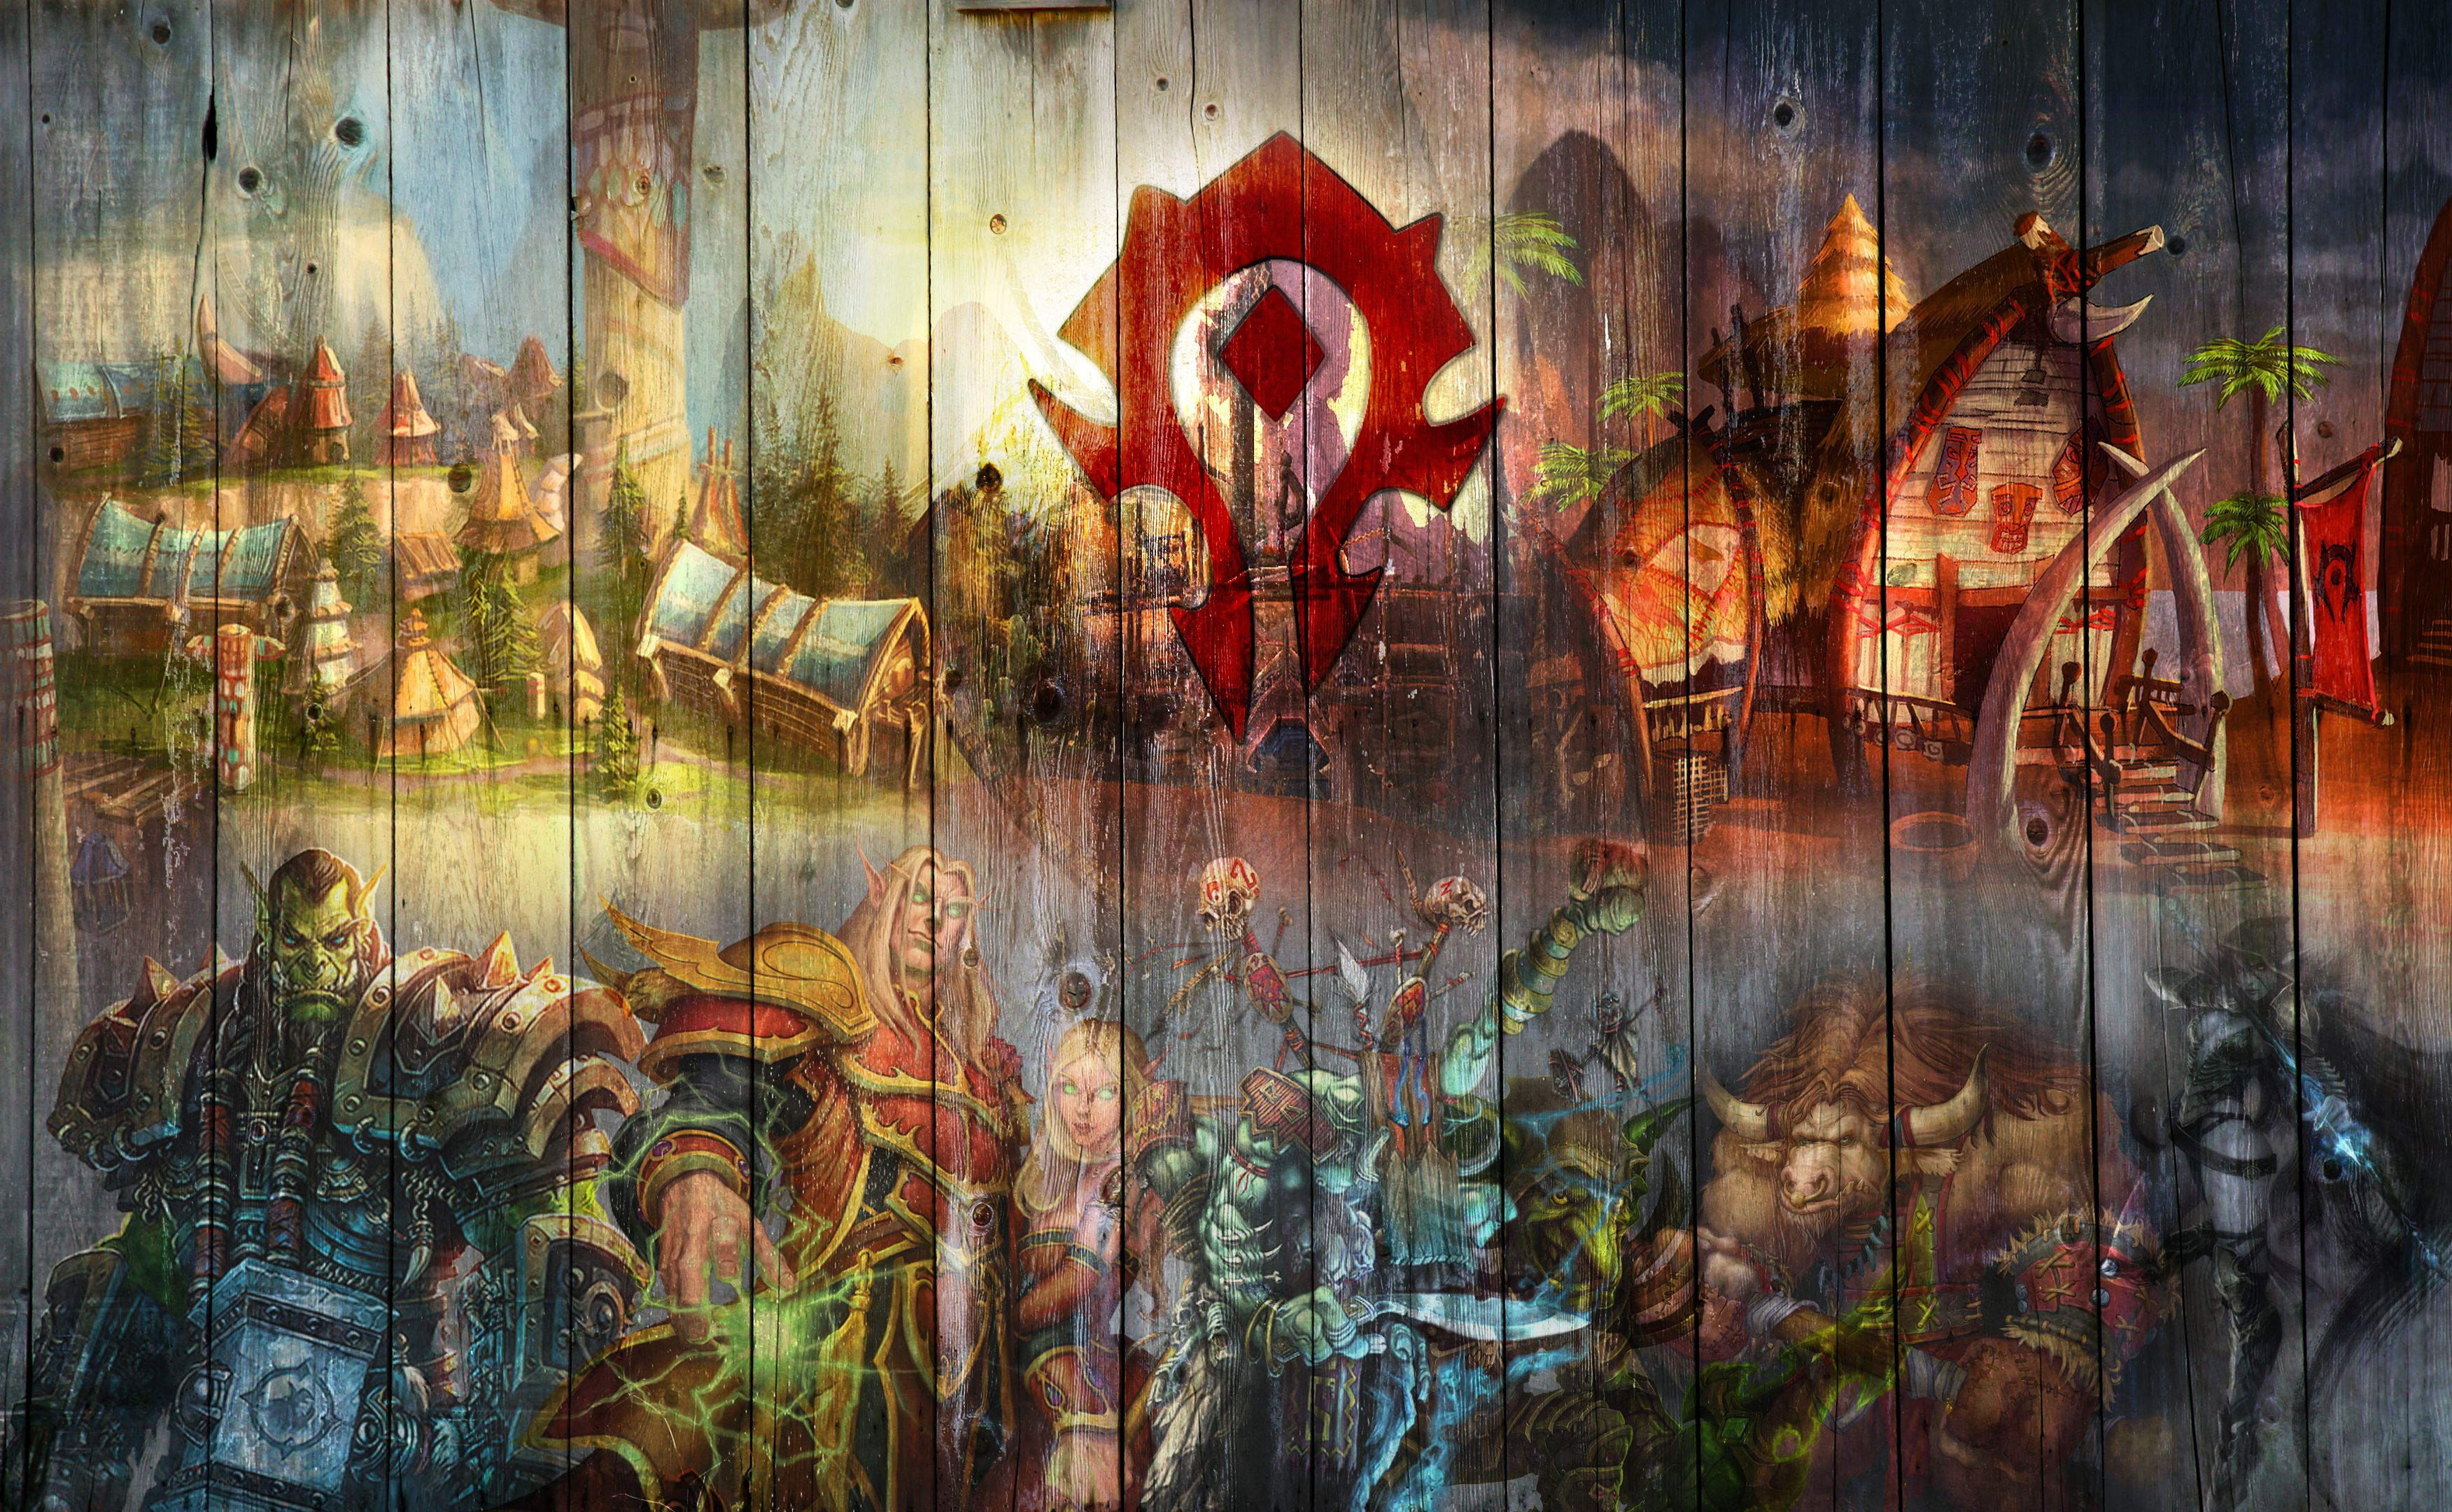 Wallpaper Horde Version By Arixev World Of Warcraft Wallpaper Warcraft Art World Of Warcraft